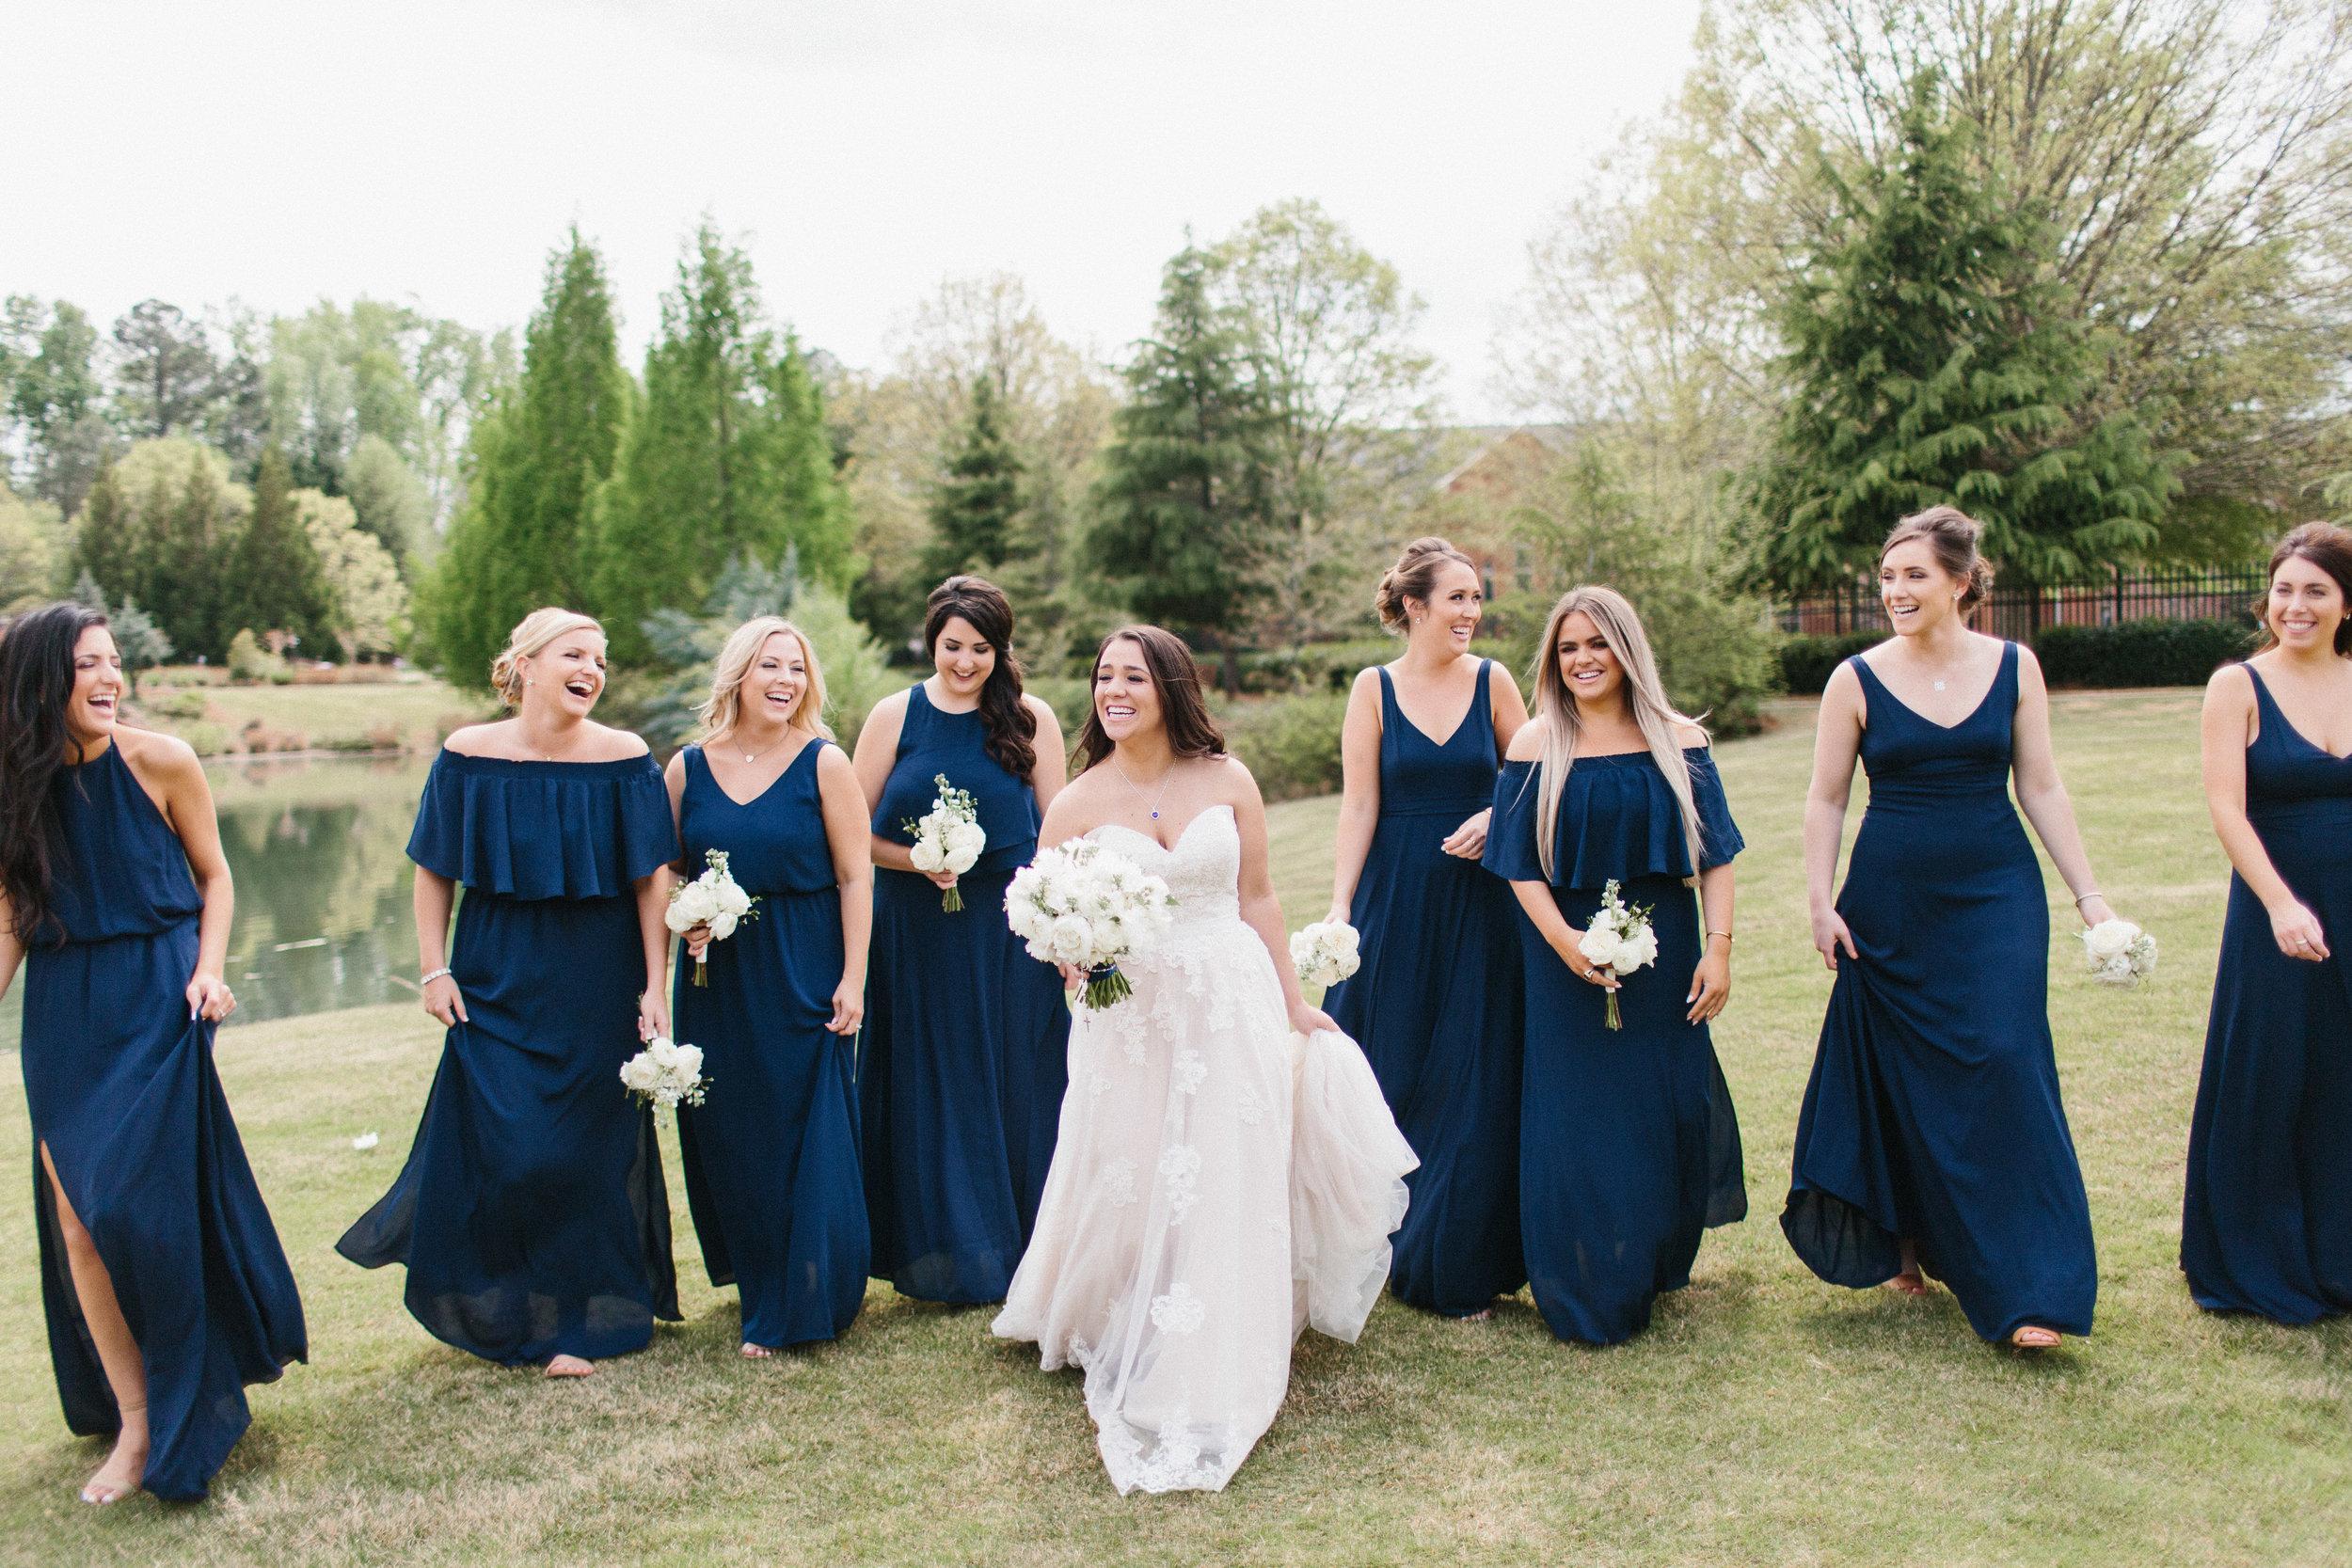 roswell_st_peter_chanel_catholic_avalon_hotel_alpharetta_wedding-1691.jpg